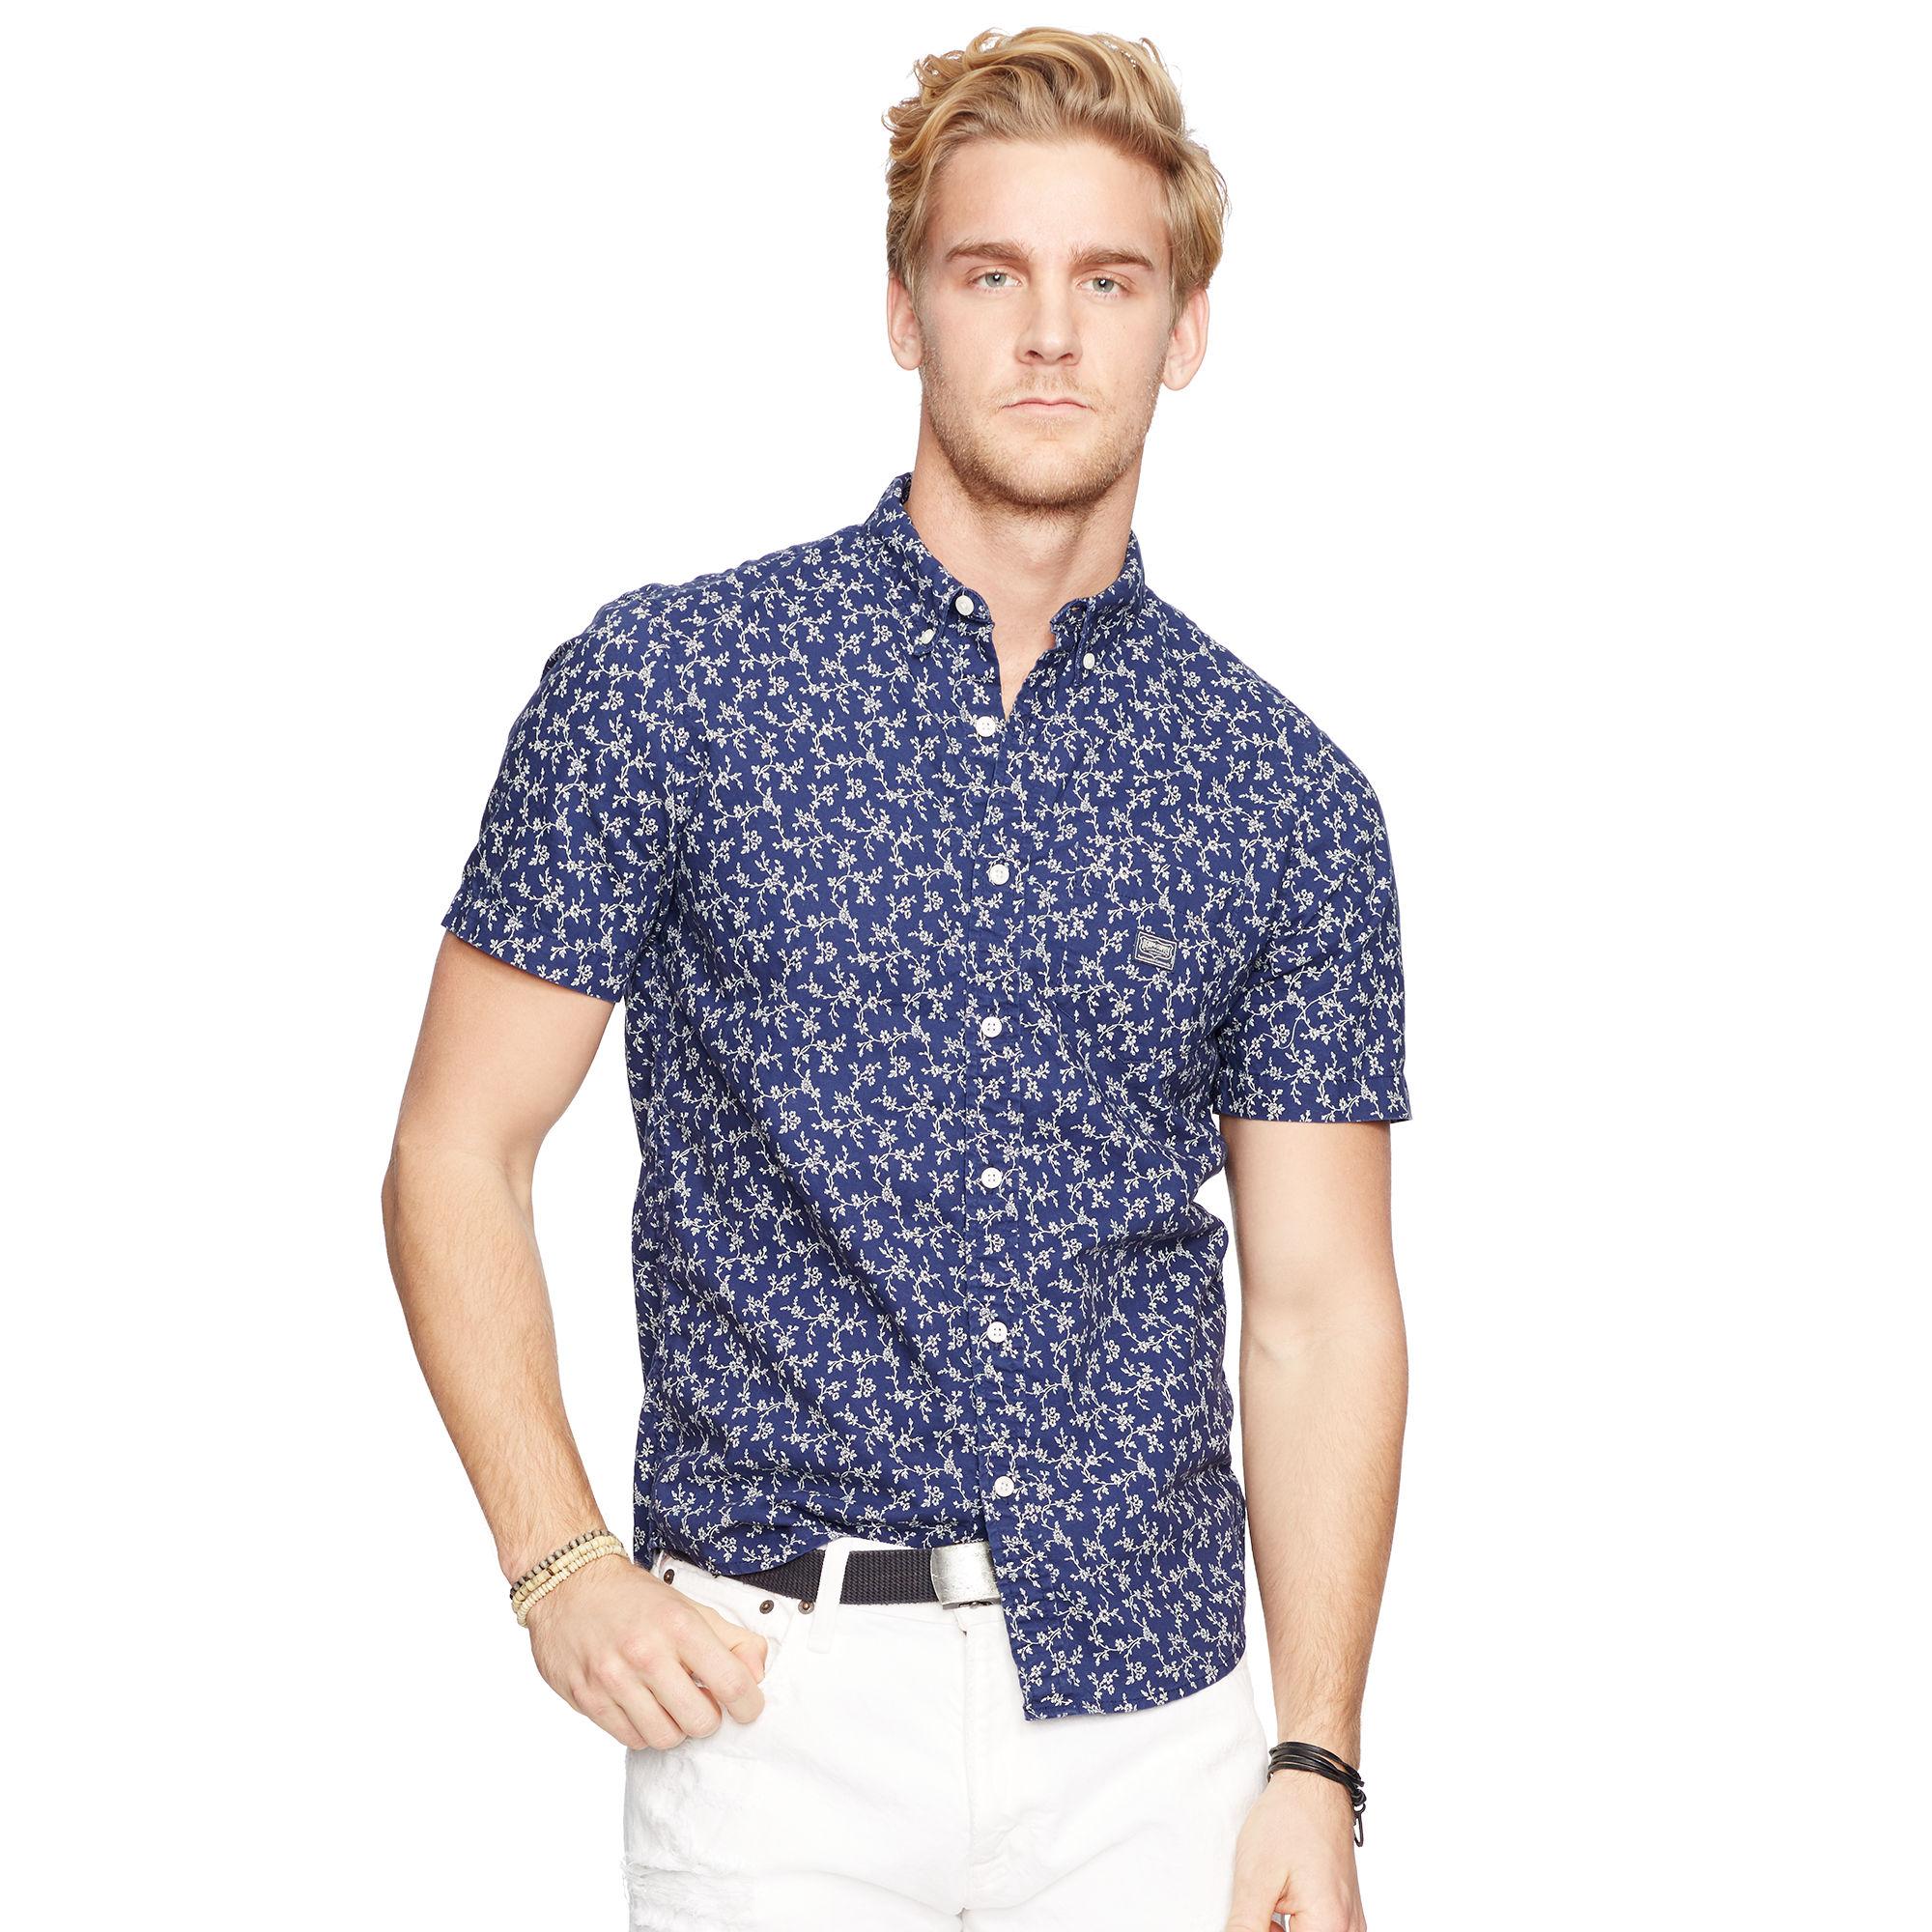 Floral Prints for Guys - Ralph Lauren Floral Poplin Sport Shirt